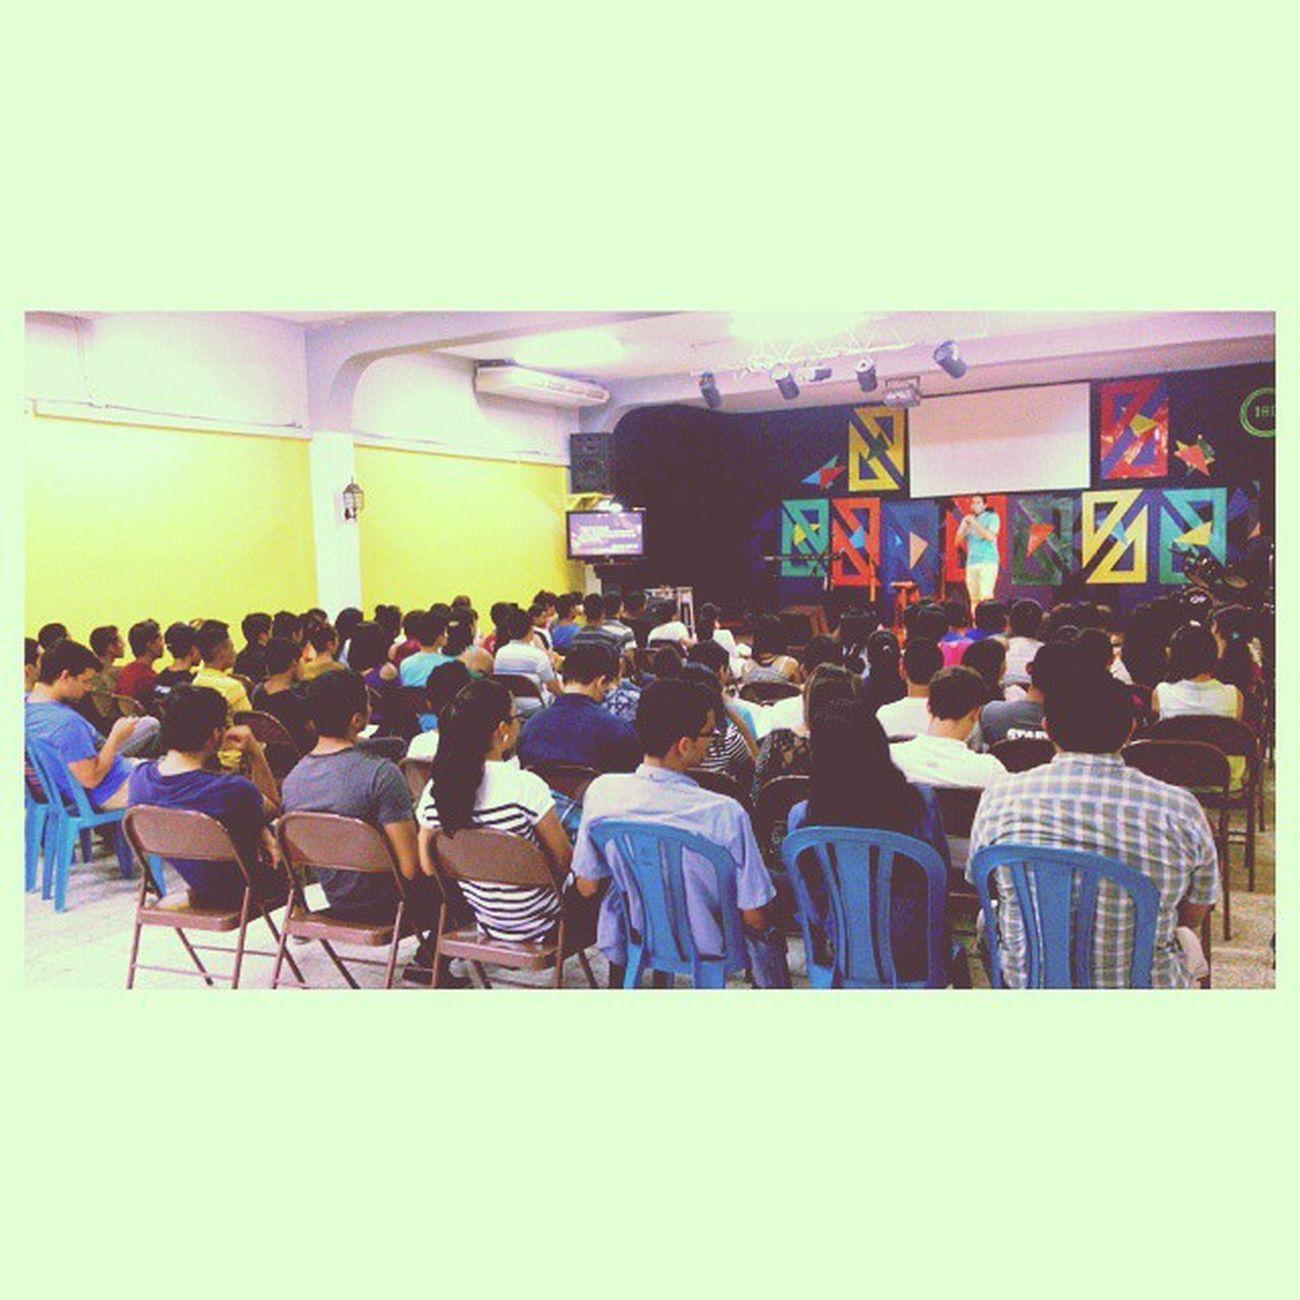 180comayagua Church Youthgroup Alteratumundo